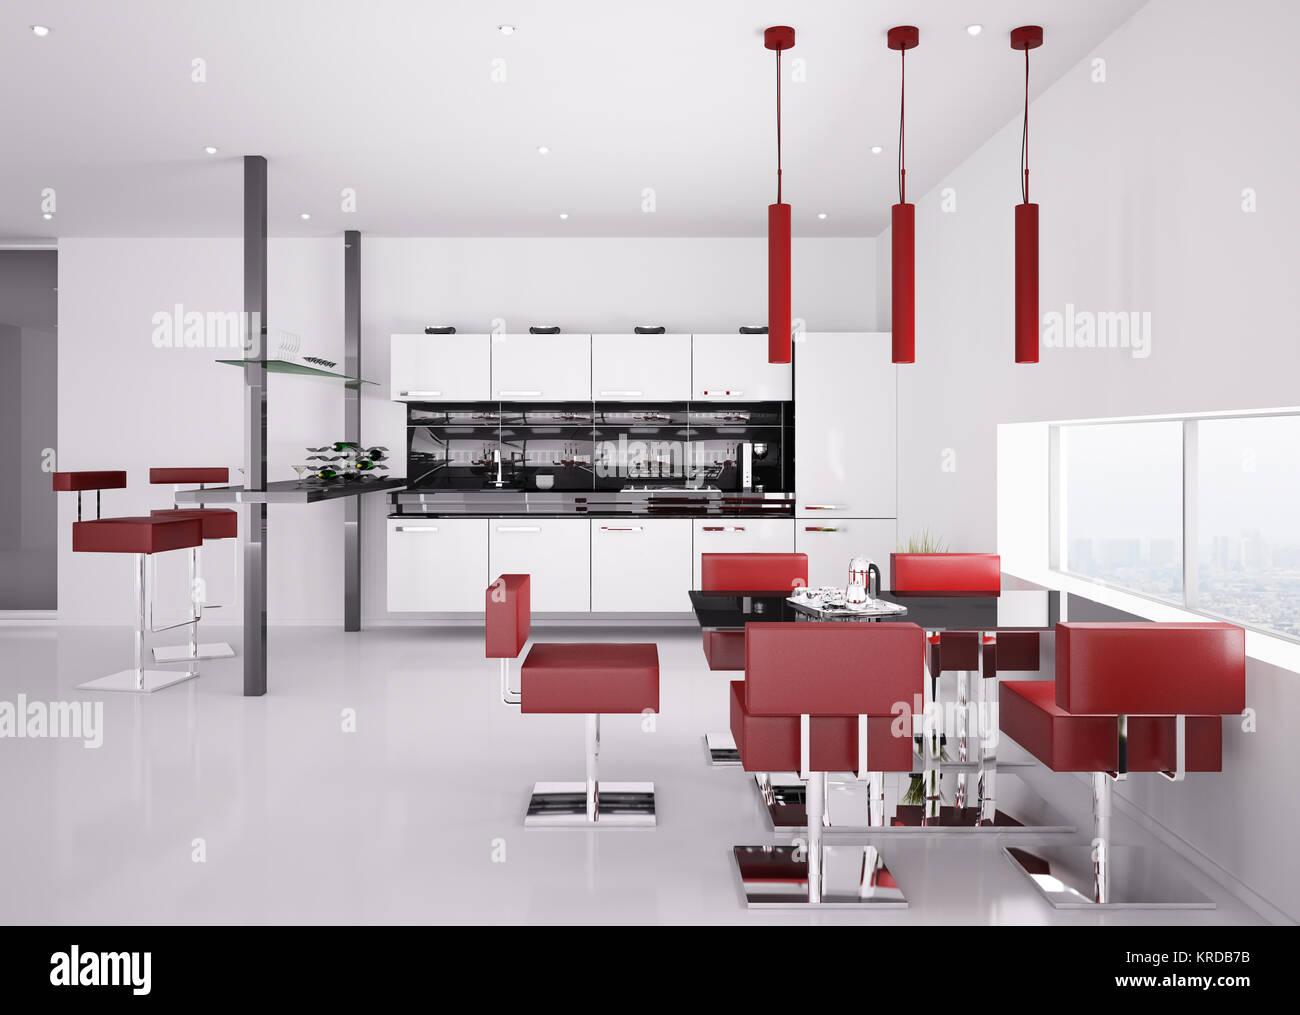 Sedie Rosse Cucina : Interno della moderna cucina bianca con sedie rosse d render foto